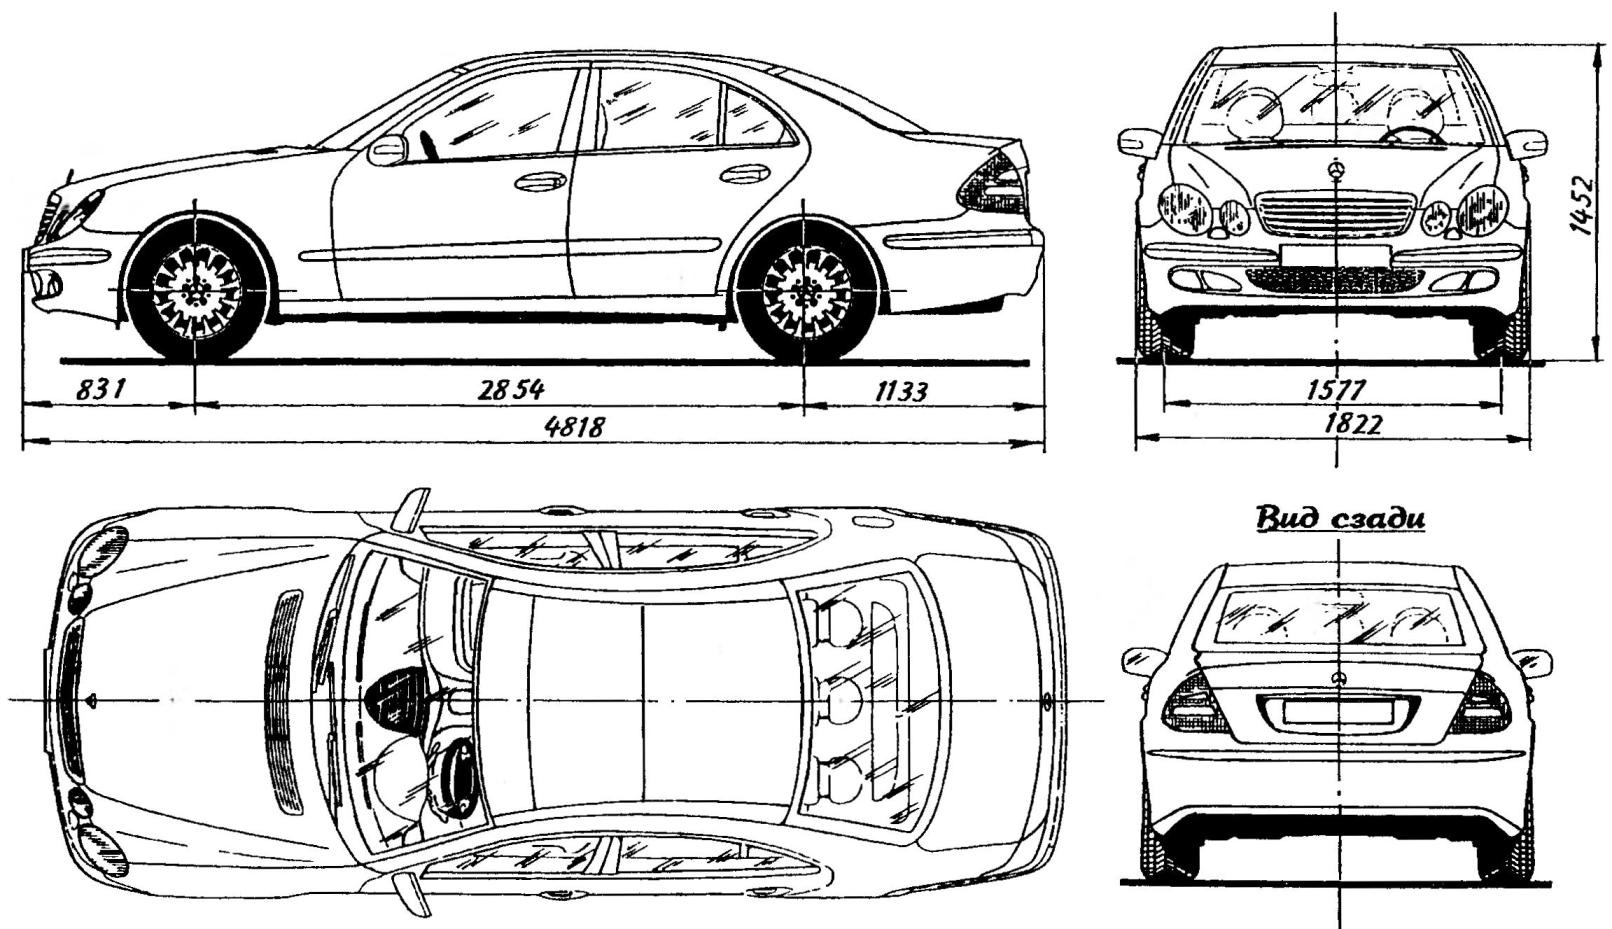 Автомобиль MERCEDES-BENZ E-class выпуска 2002 г.